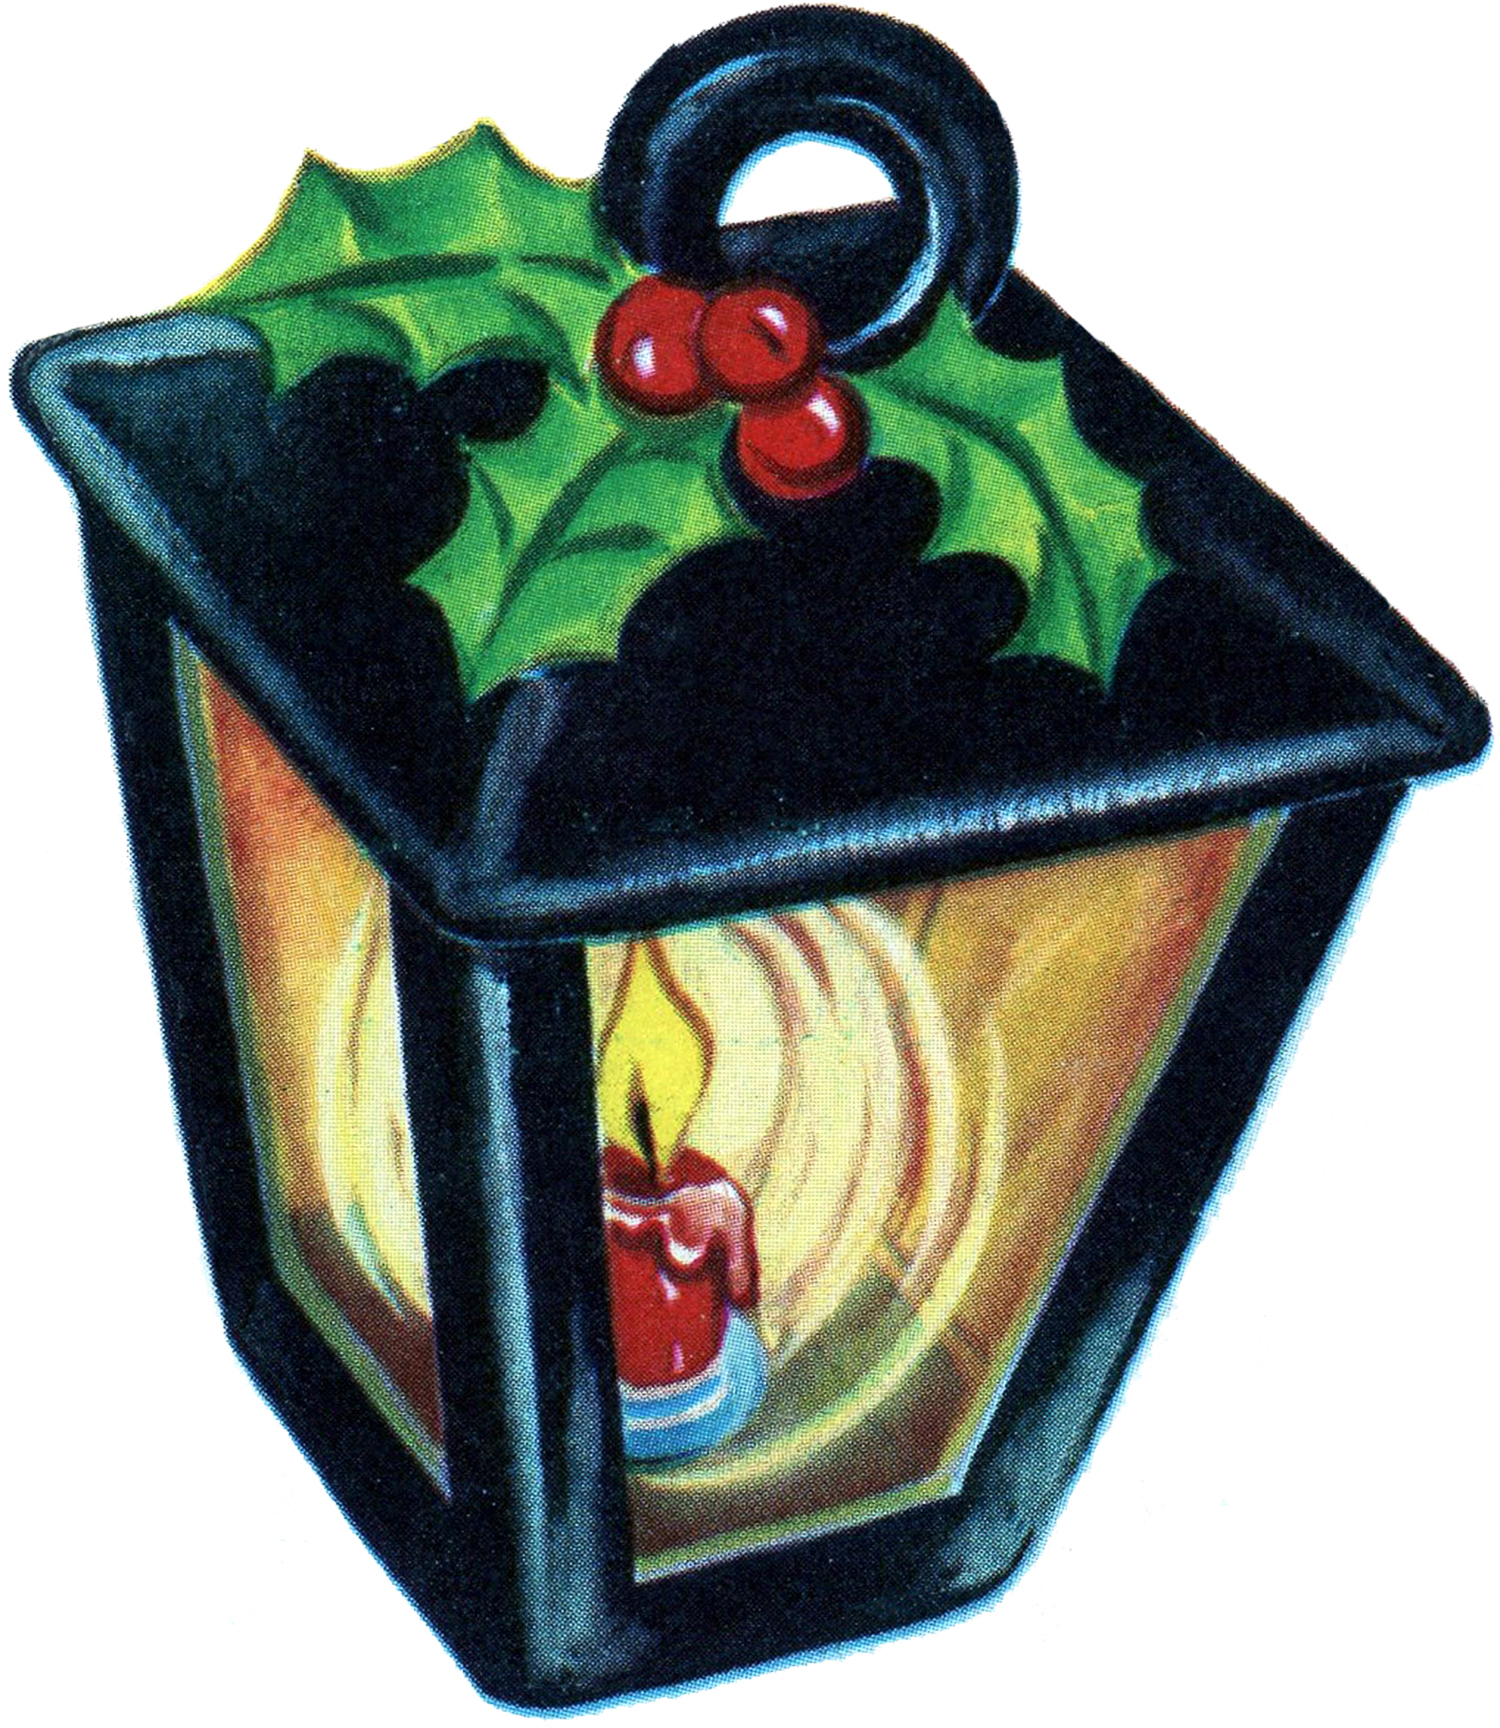 Retro Christmas Lantern Image